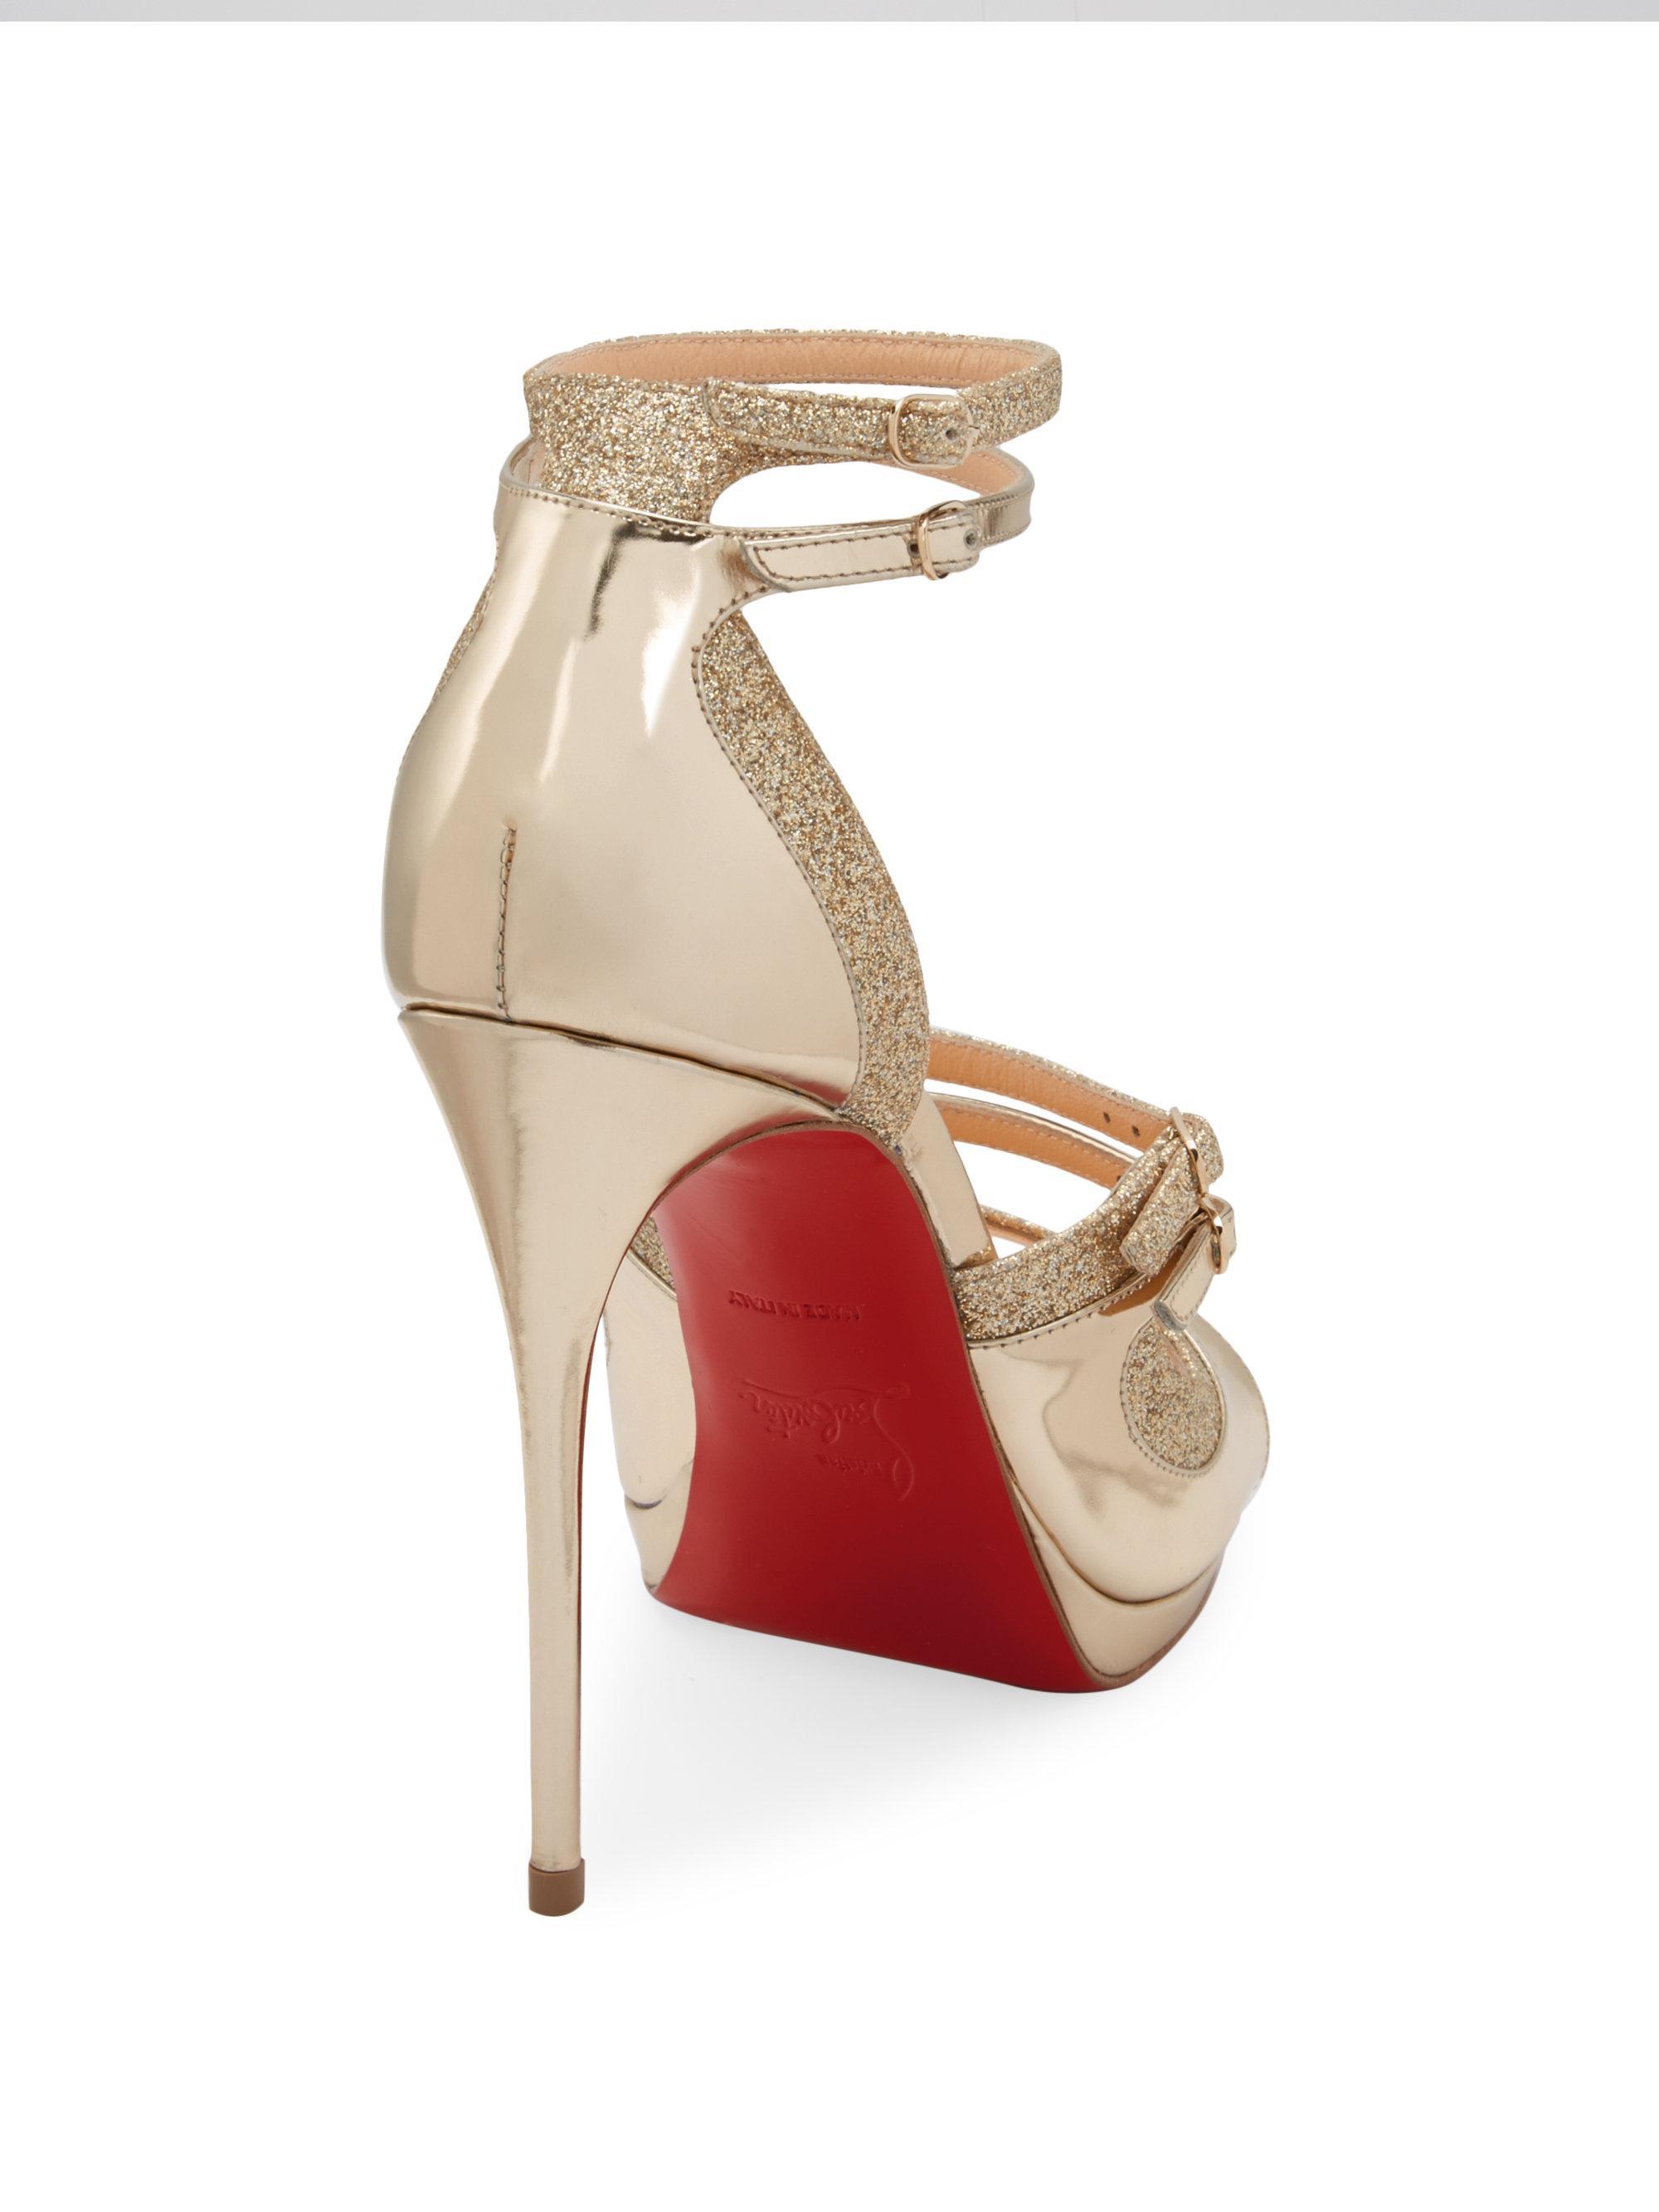 e22cb940e4c Christian Louboutin Sotto Sopra Metallic Red Sole Sandal in Metallic ...